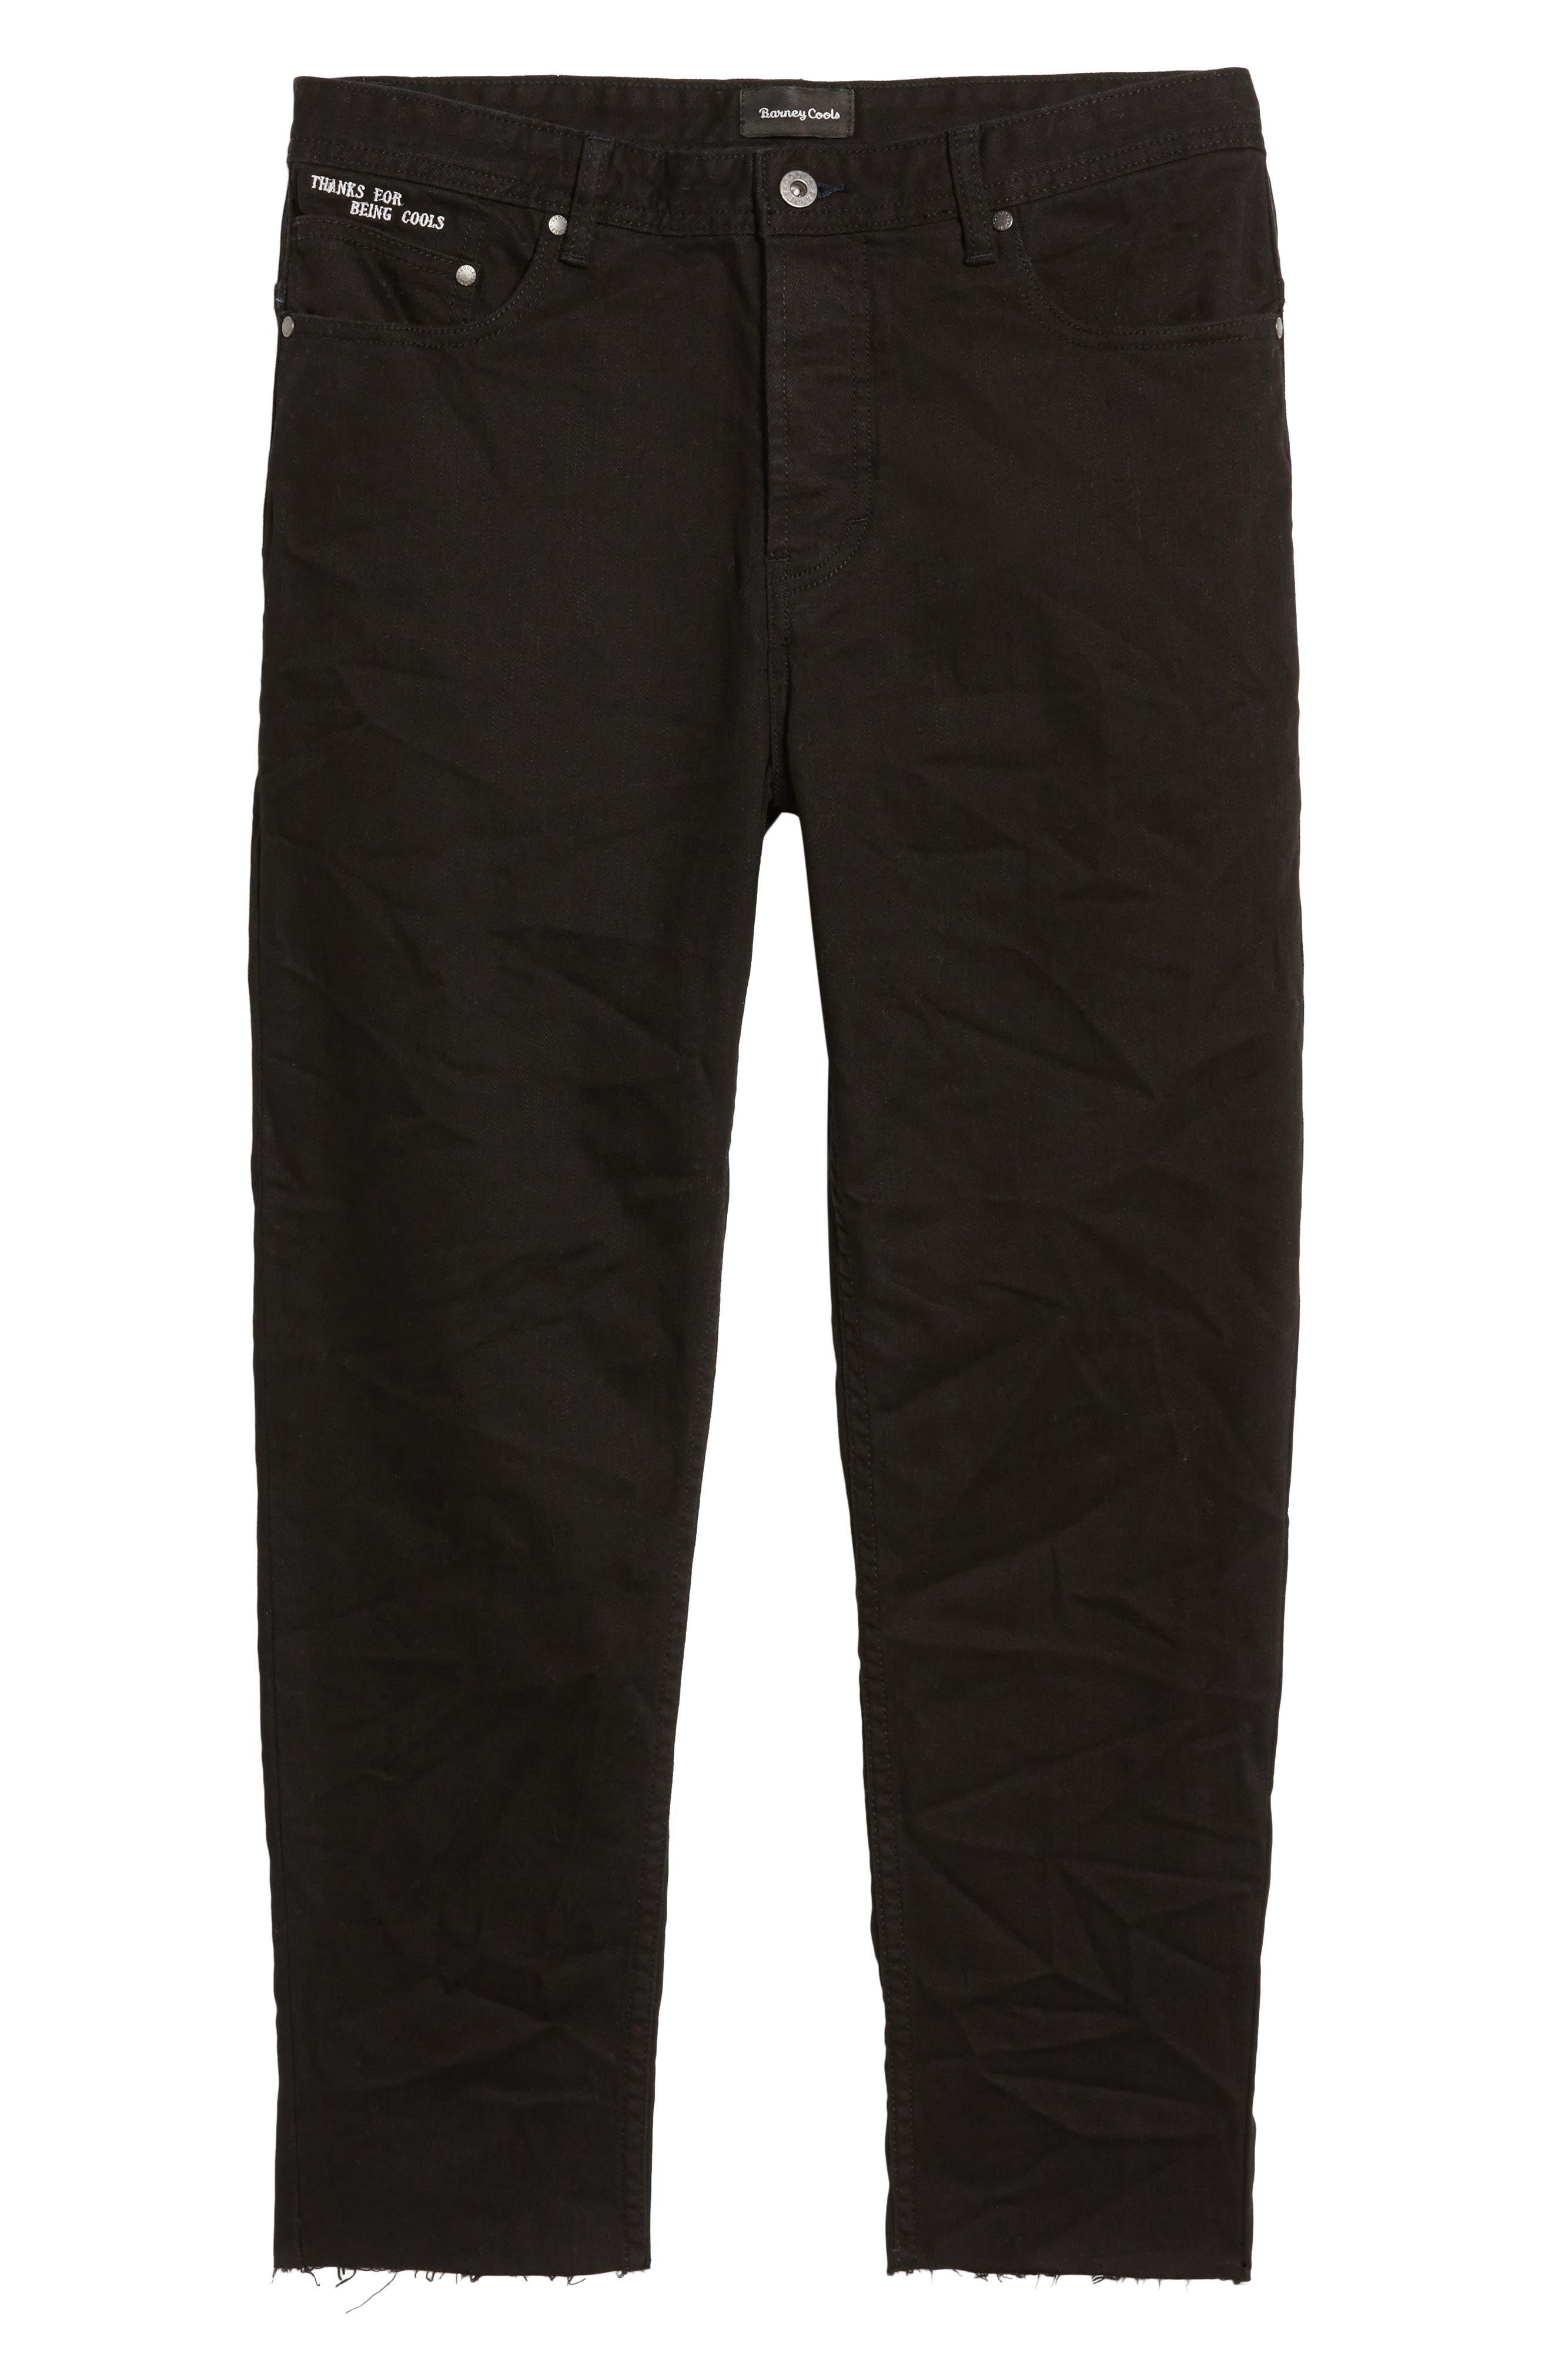 B.Line Crop Slim Fit Jeans,                             Alternate thumbnail 6, color,                             Washed Black